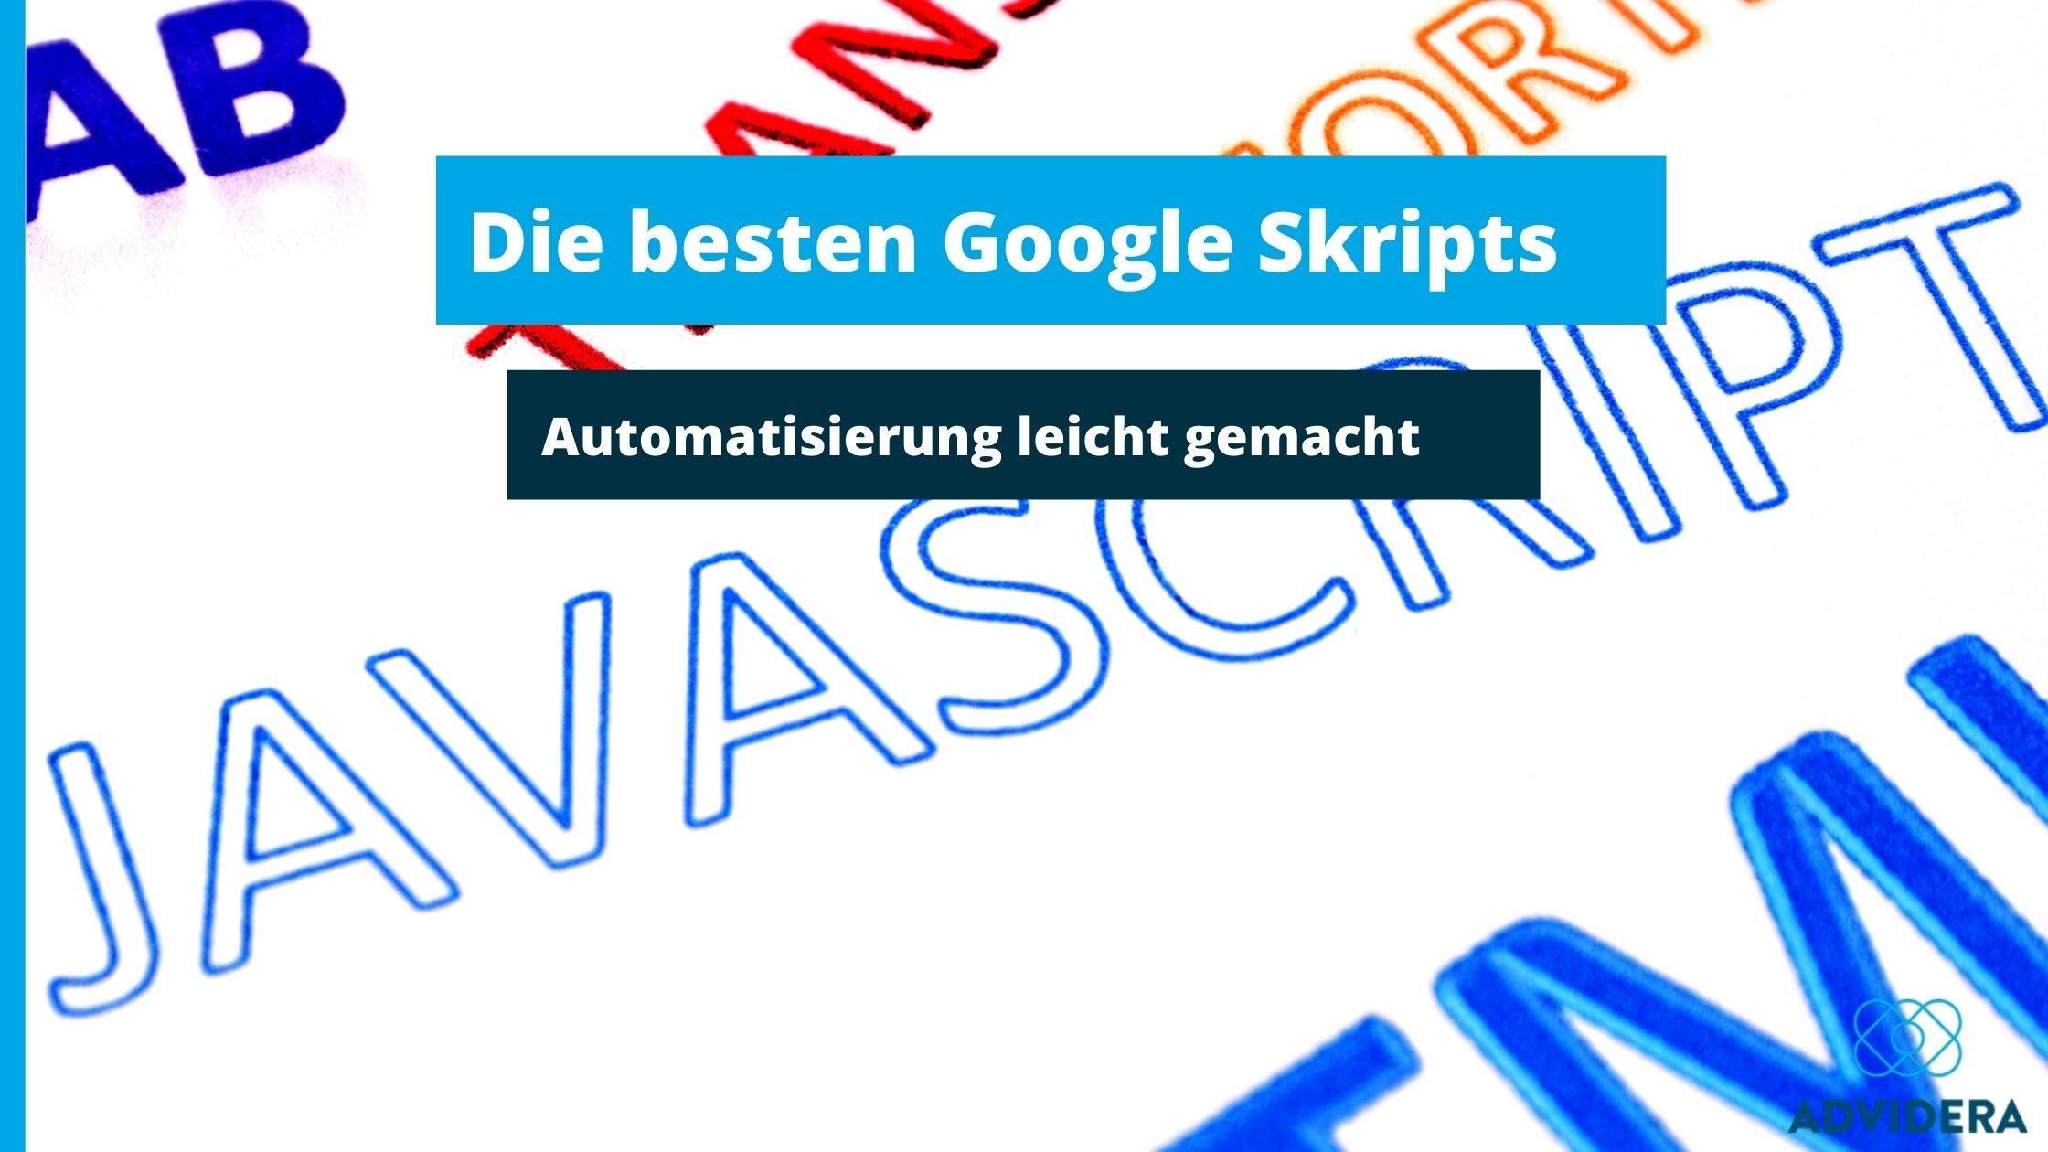 Google Skripts